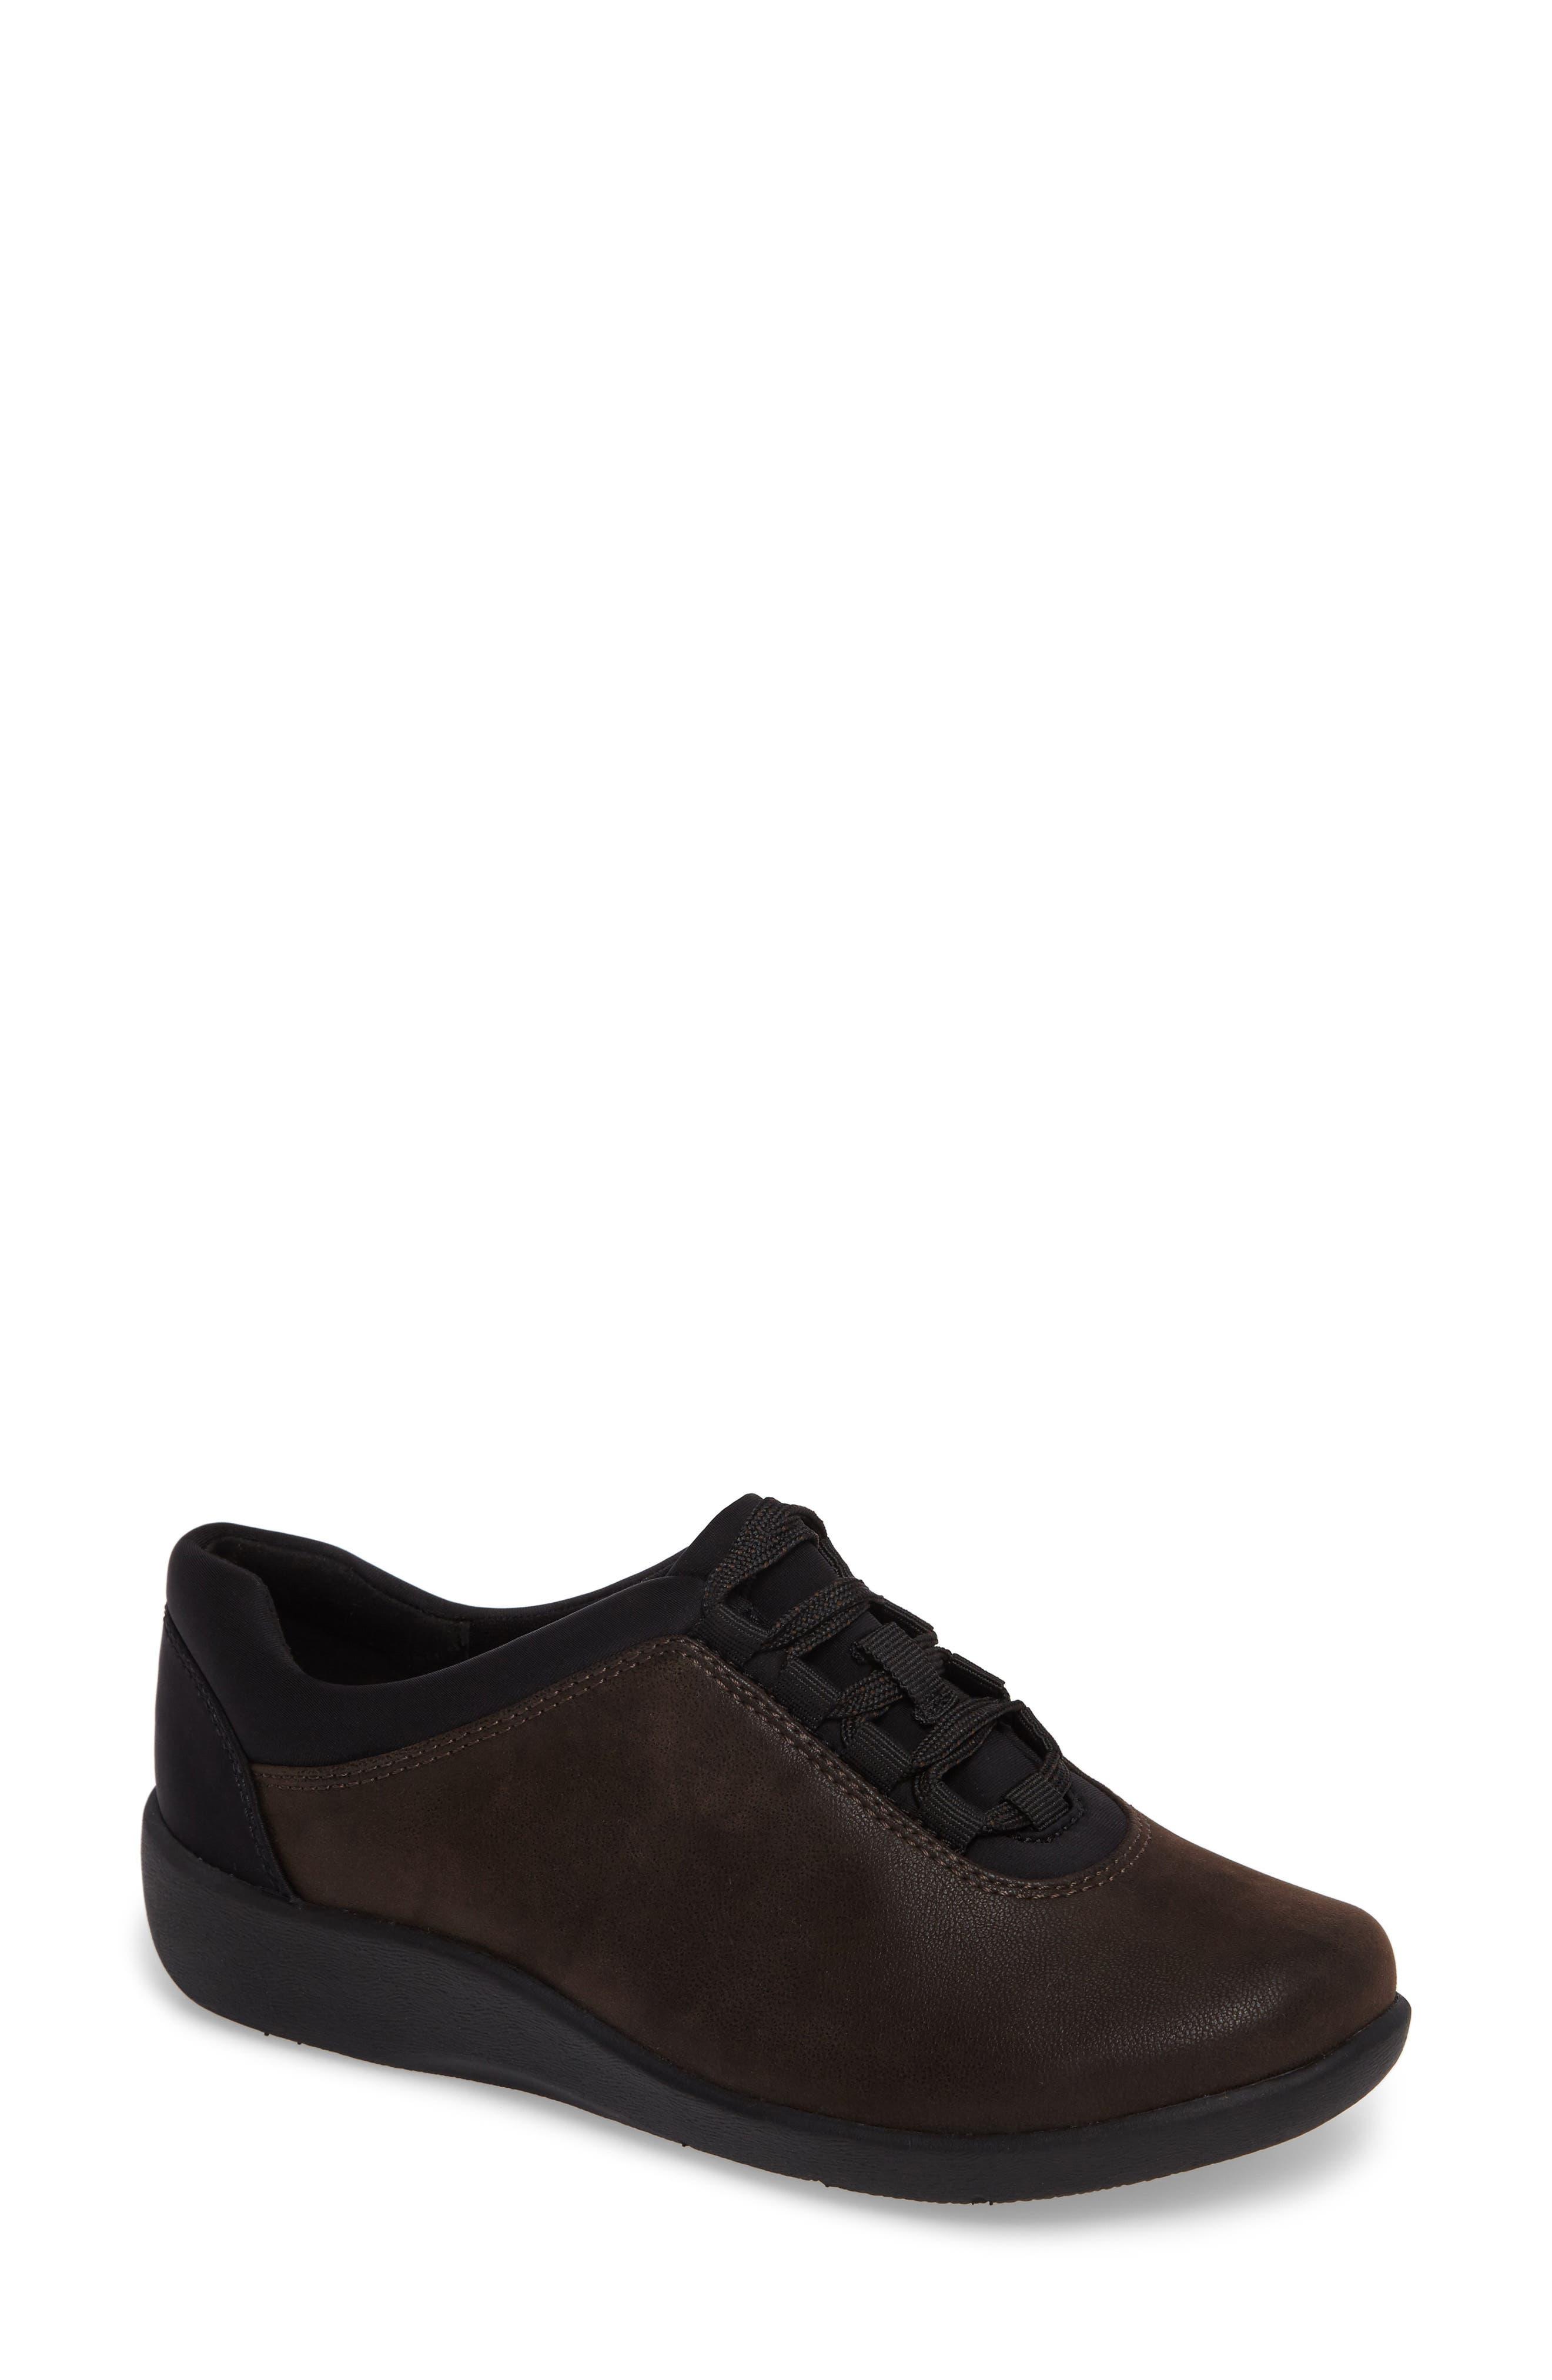 Sillian Pine Sneaker,                             Main thumbnail 1, color,                             BROWN CANVAS